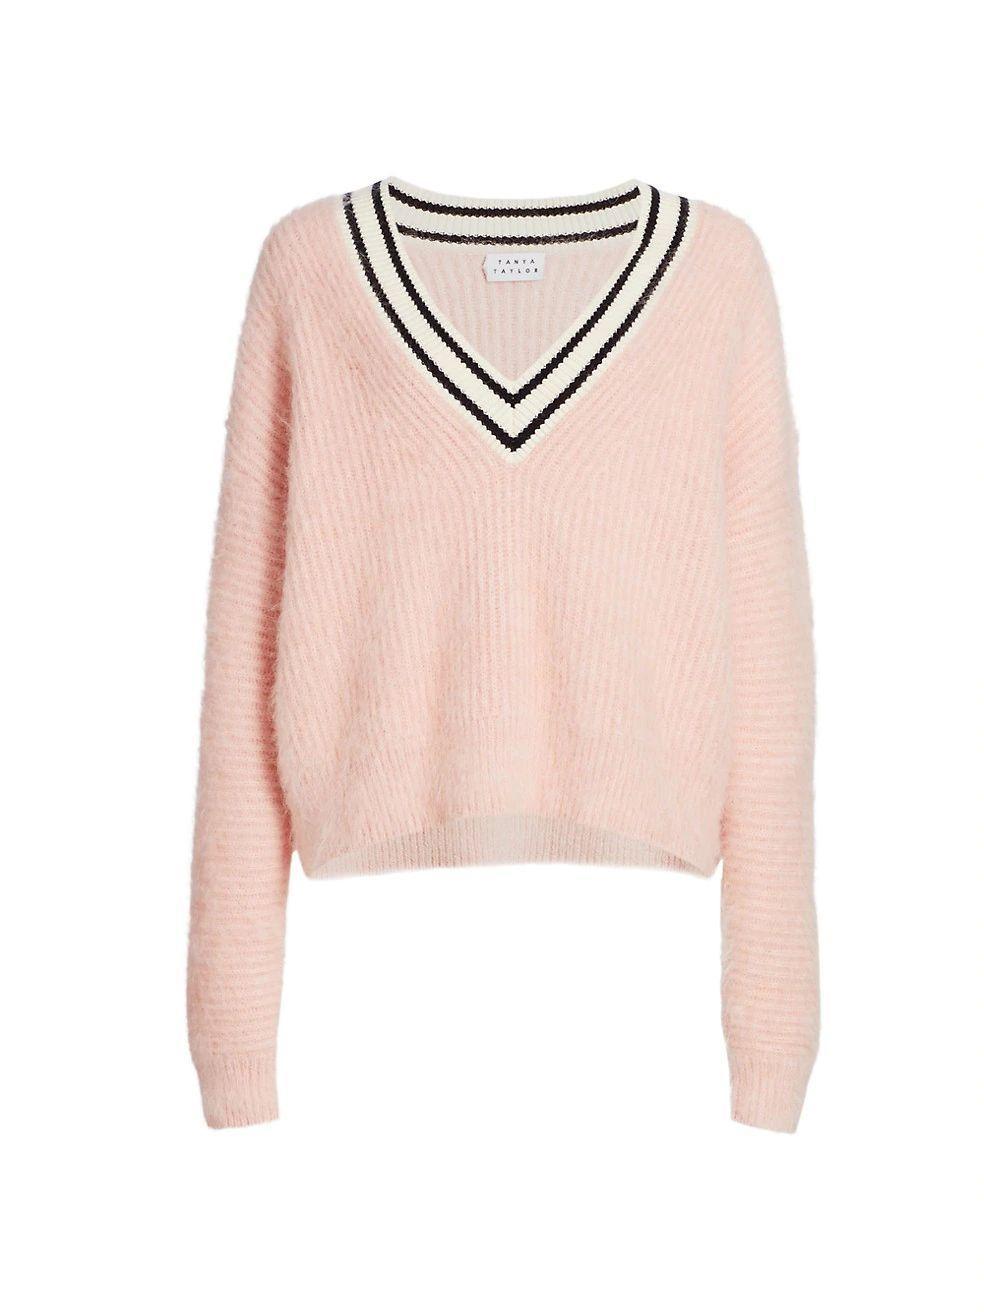 Millie Sweater Item # H20K521843